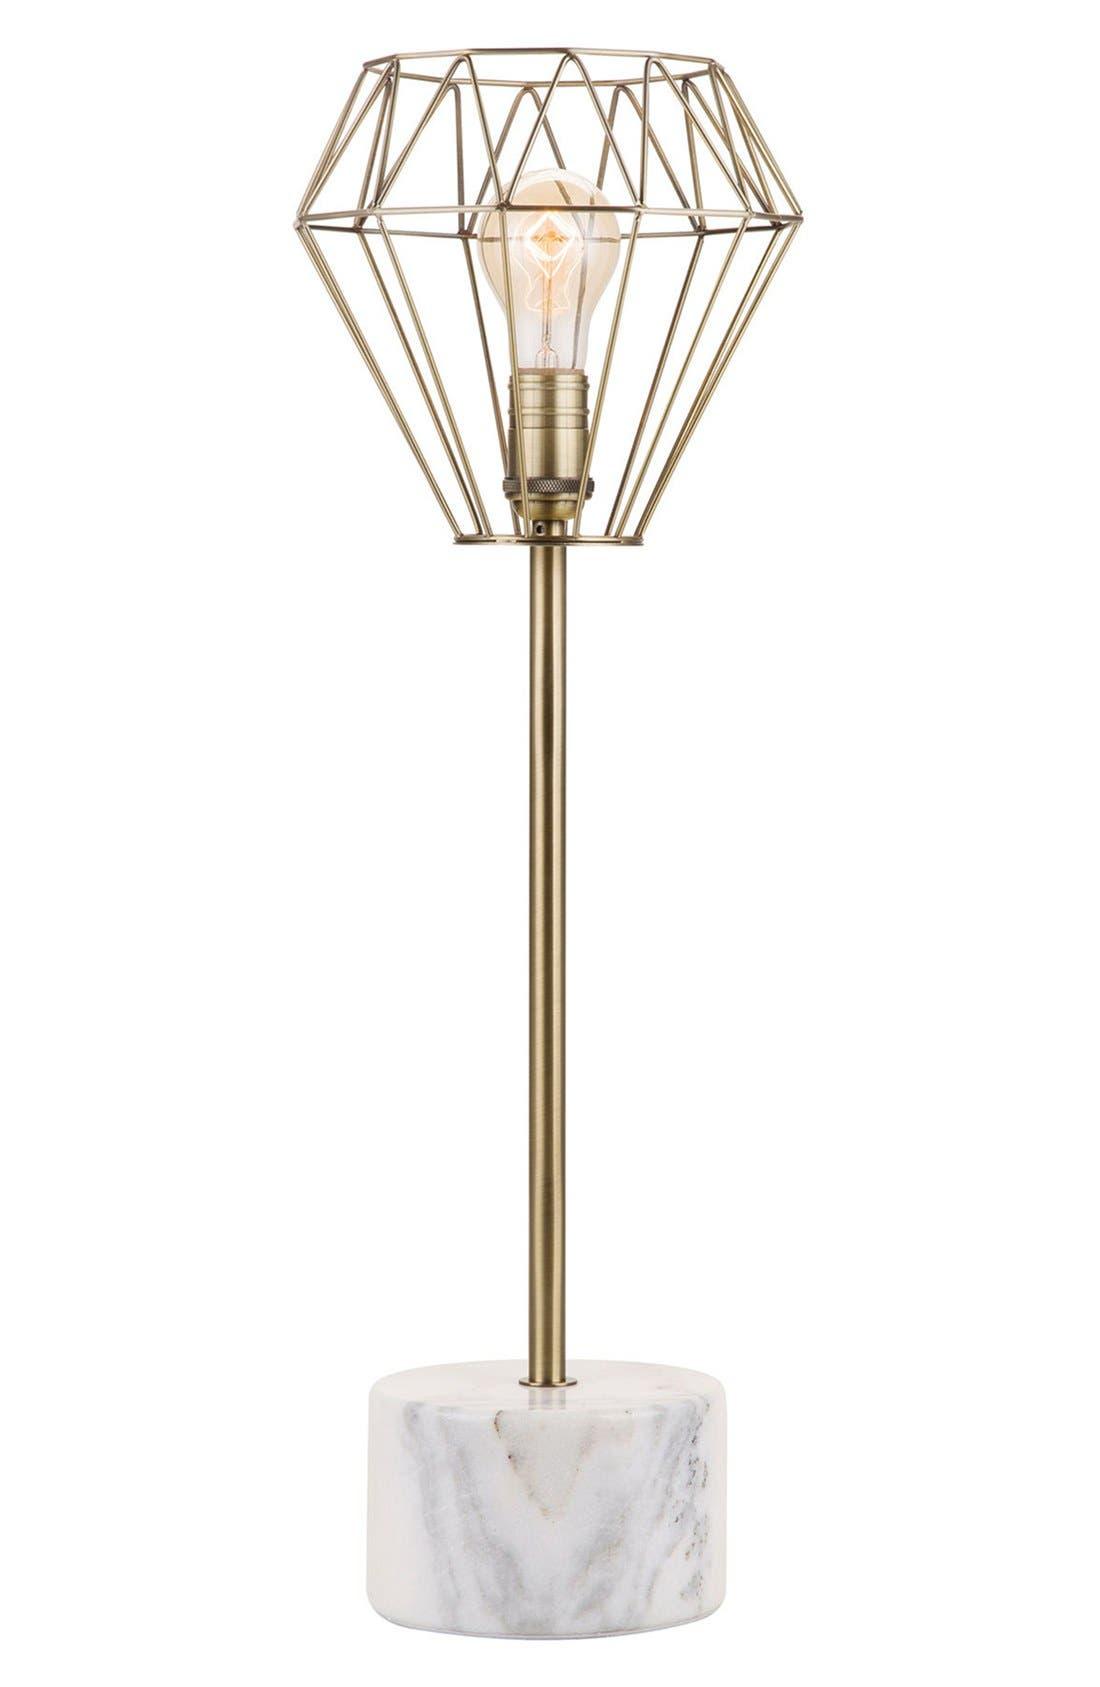 JAlexander Brass & Marble Table Lamp,                         Main,                         color, Metallic Gold